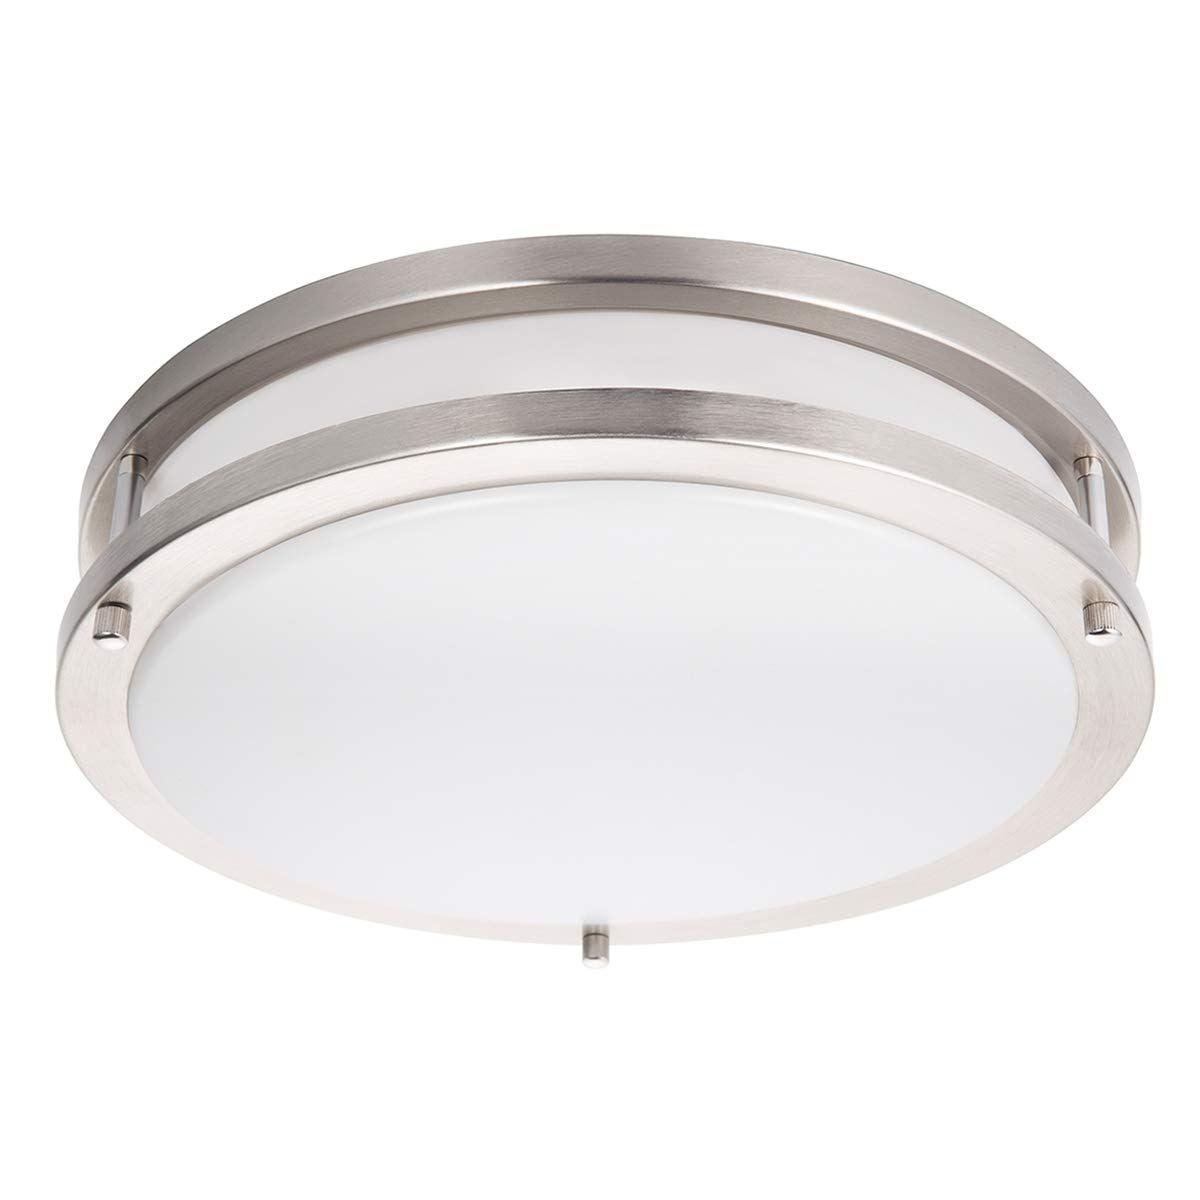 Drosbey 36w Led Ceiling Light Fixture 13in Flush Mount Light